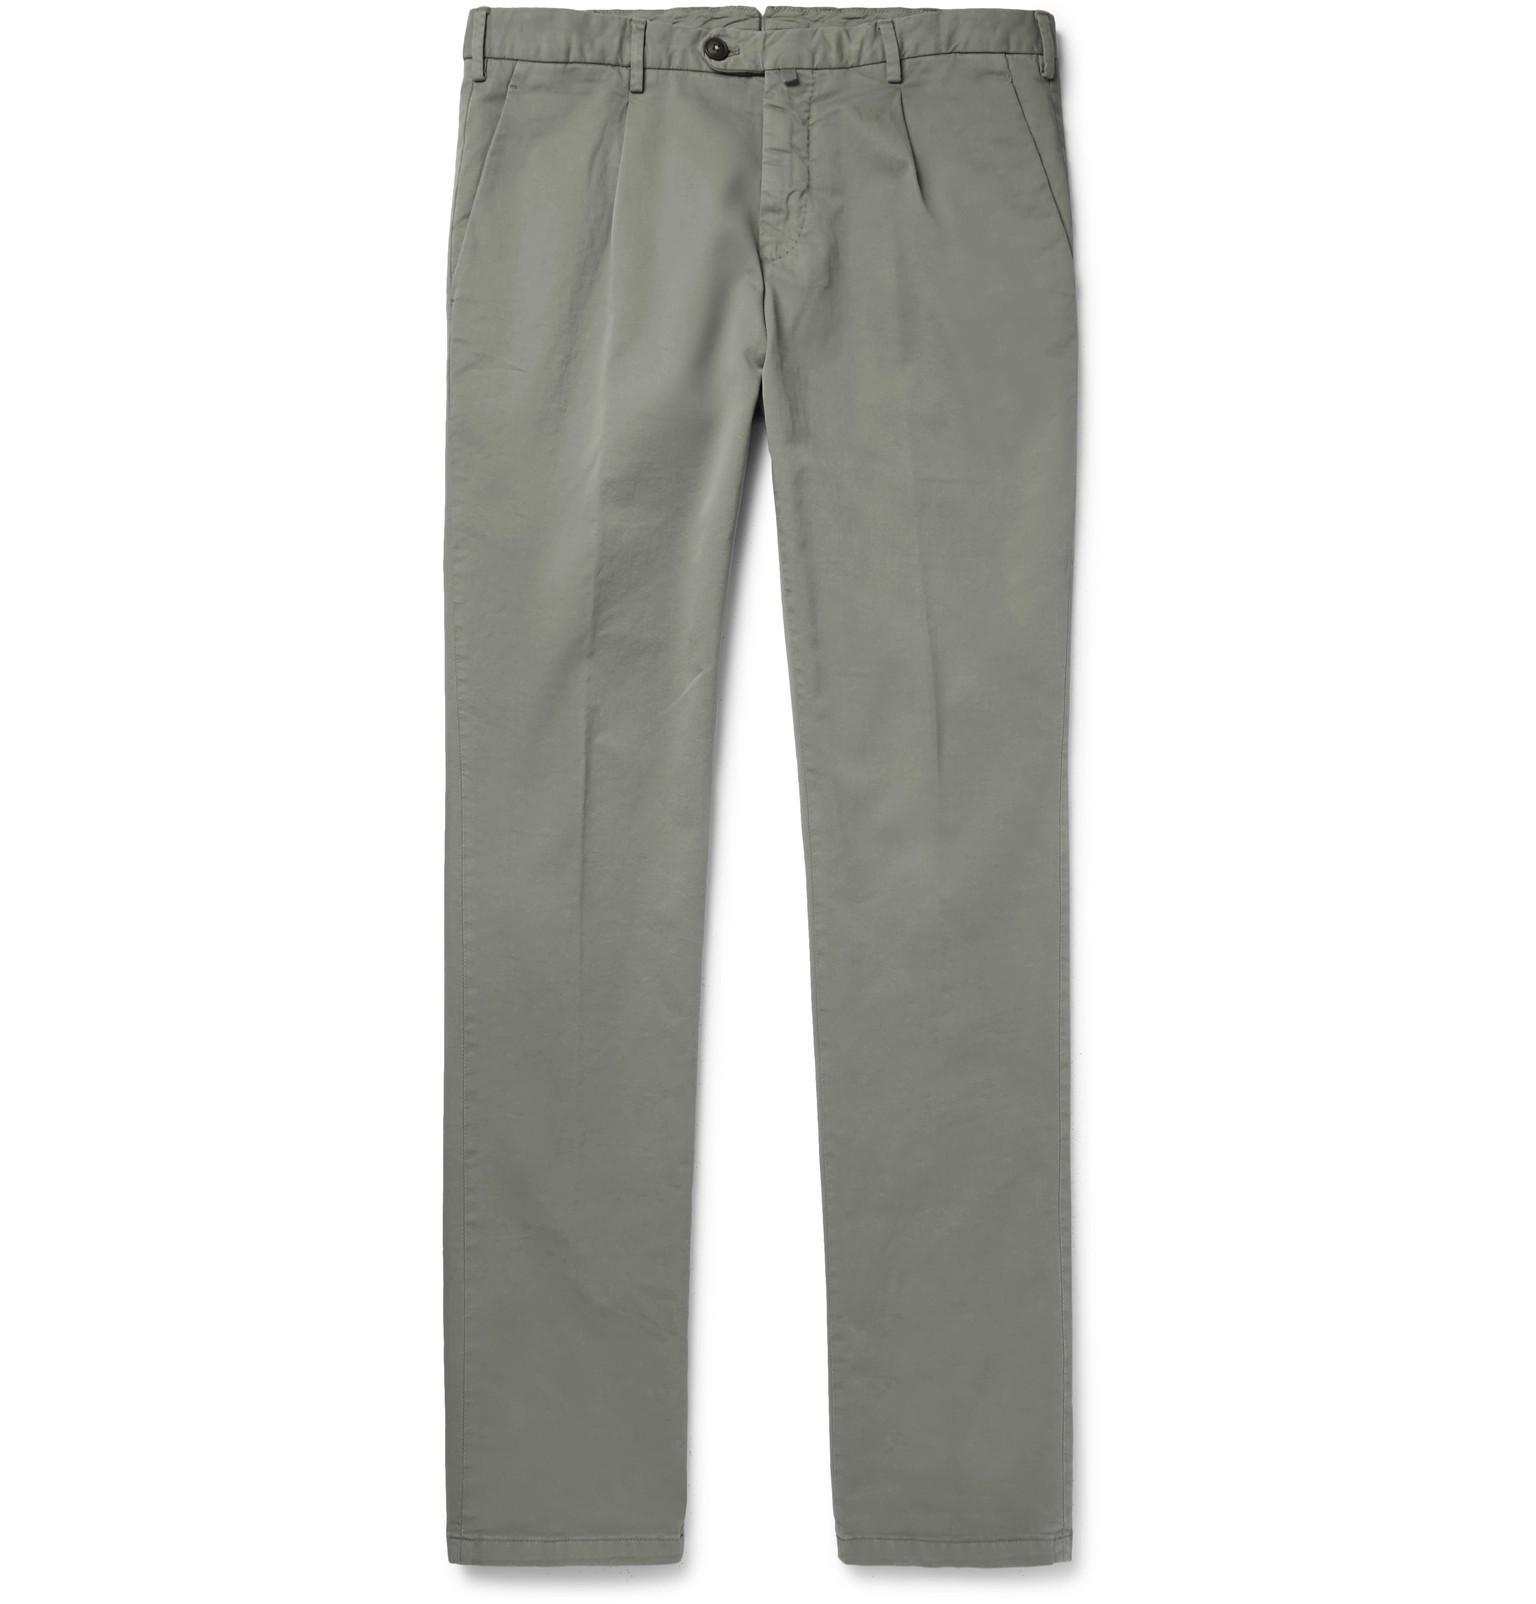 Thom Sweeney Pleated Stretch-cotton Chinos - Light gray awcvJURn